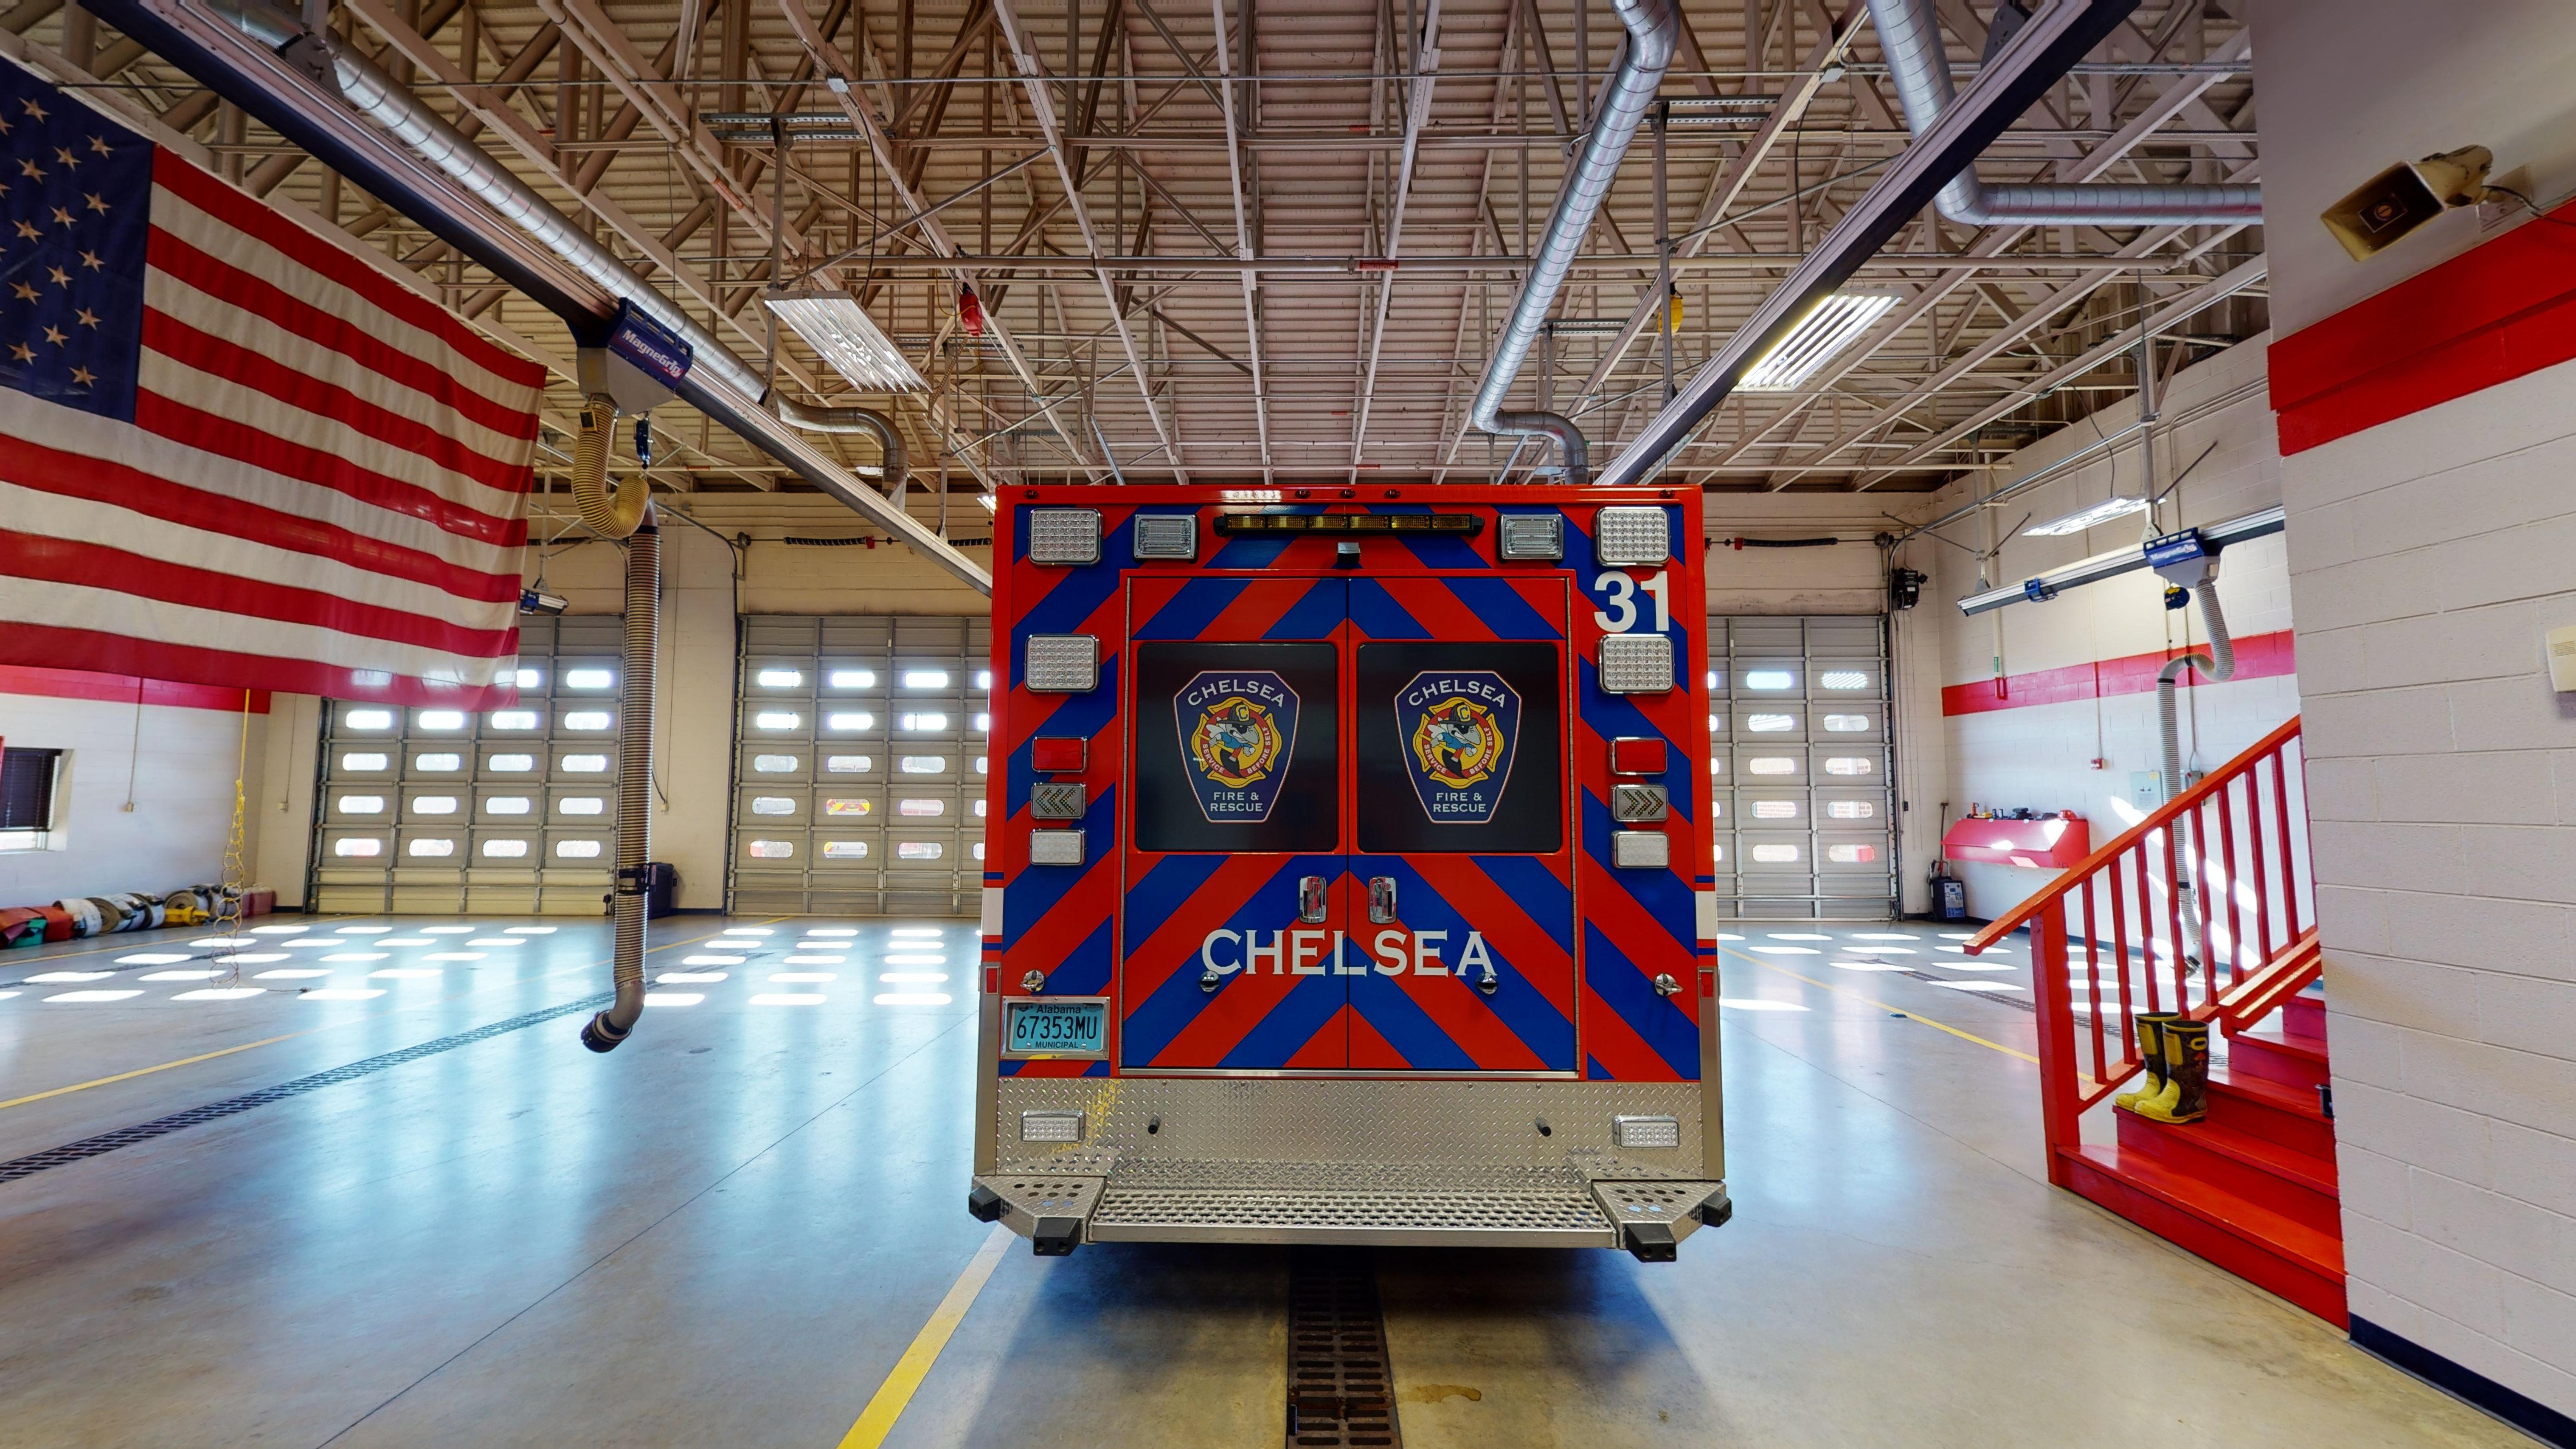 5_Chelsea-Fire-Rescue-Demers-151-06162021_101145